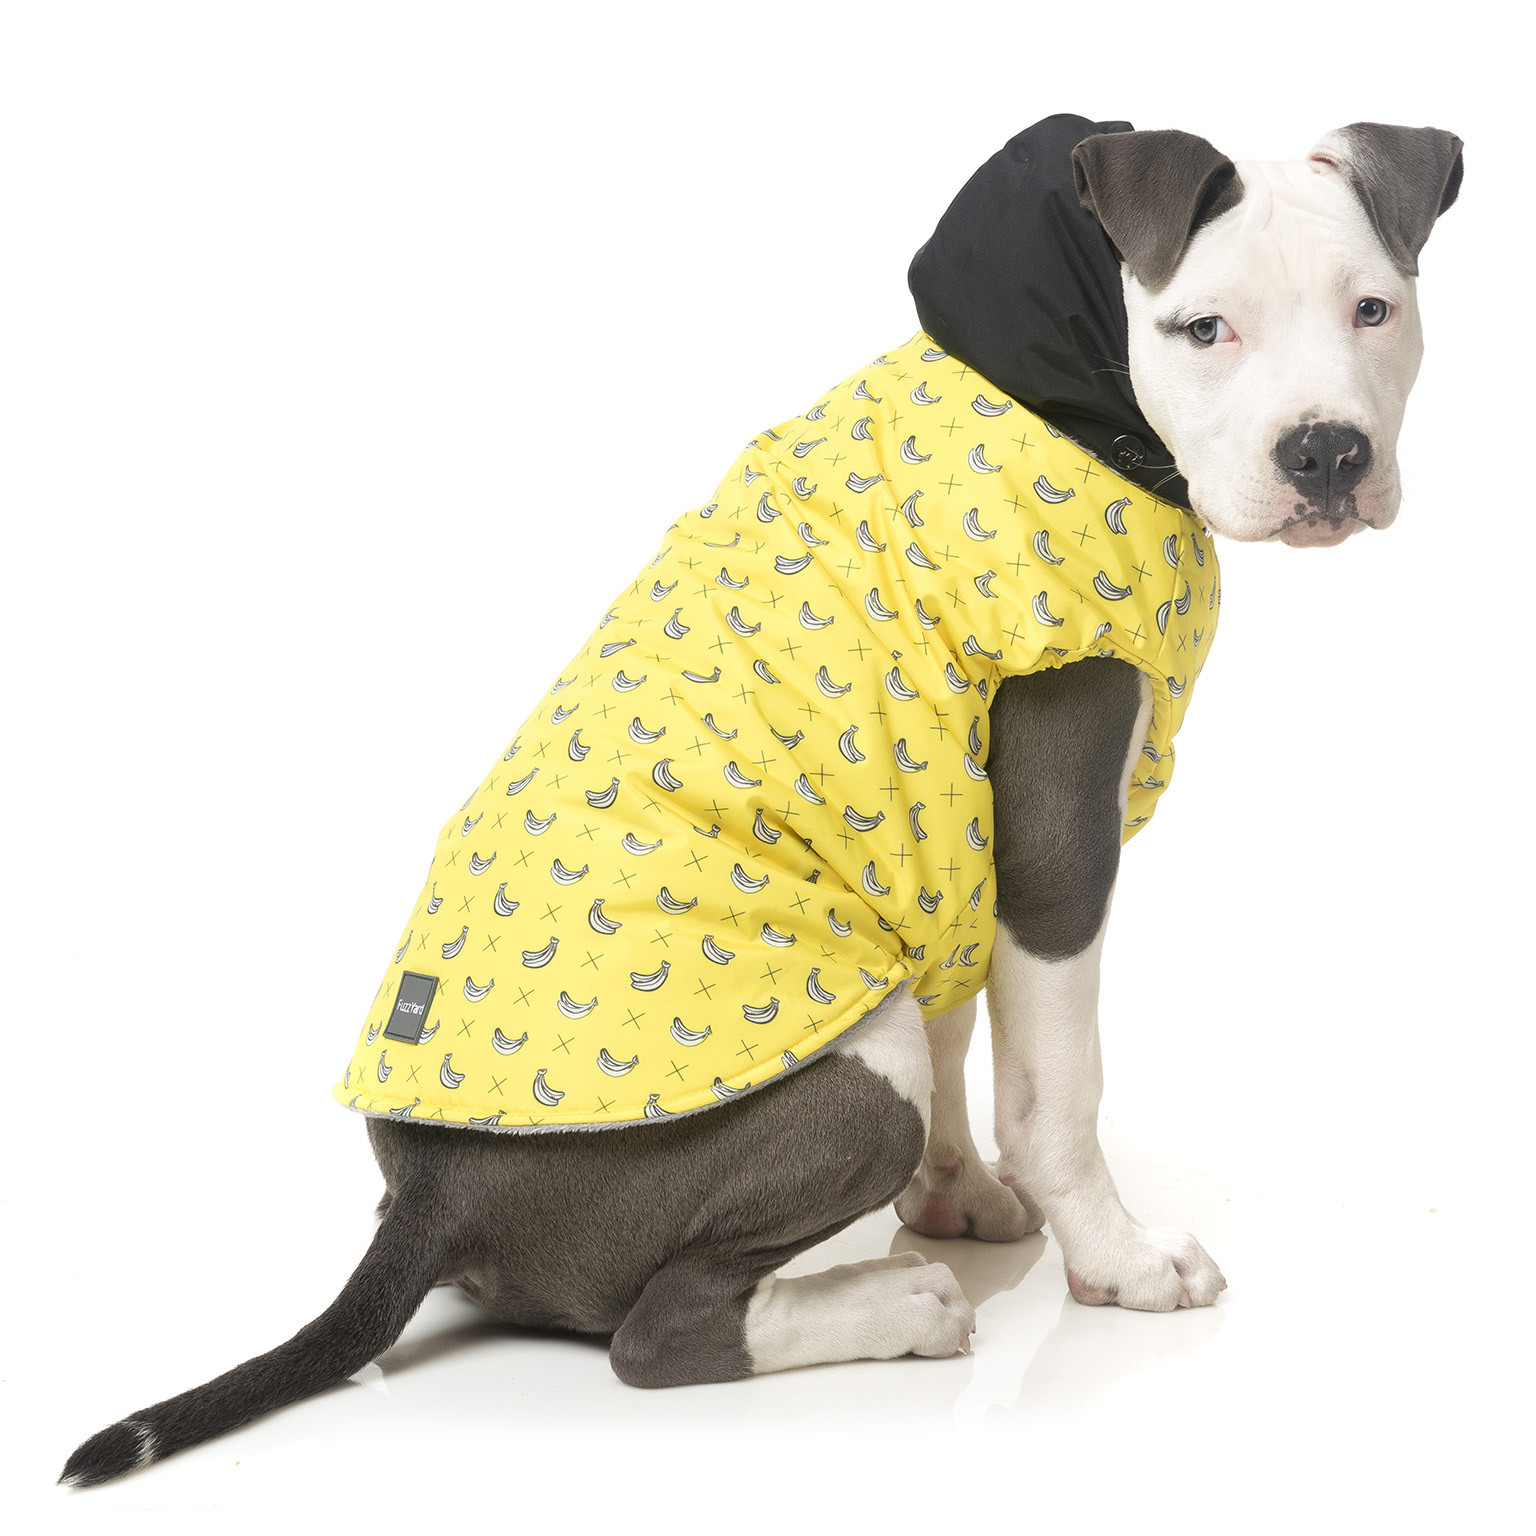 fuzzyard-jacket-parka-monkeymania-dog-1.jpg